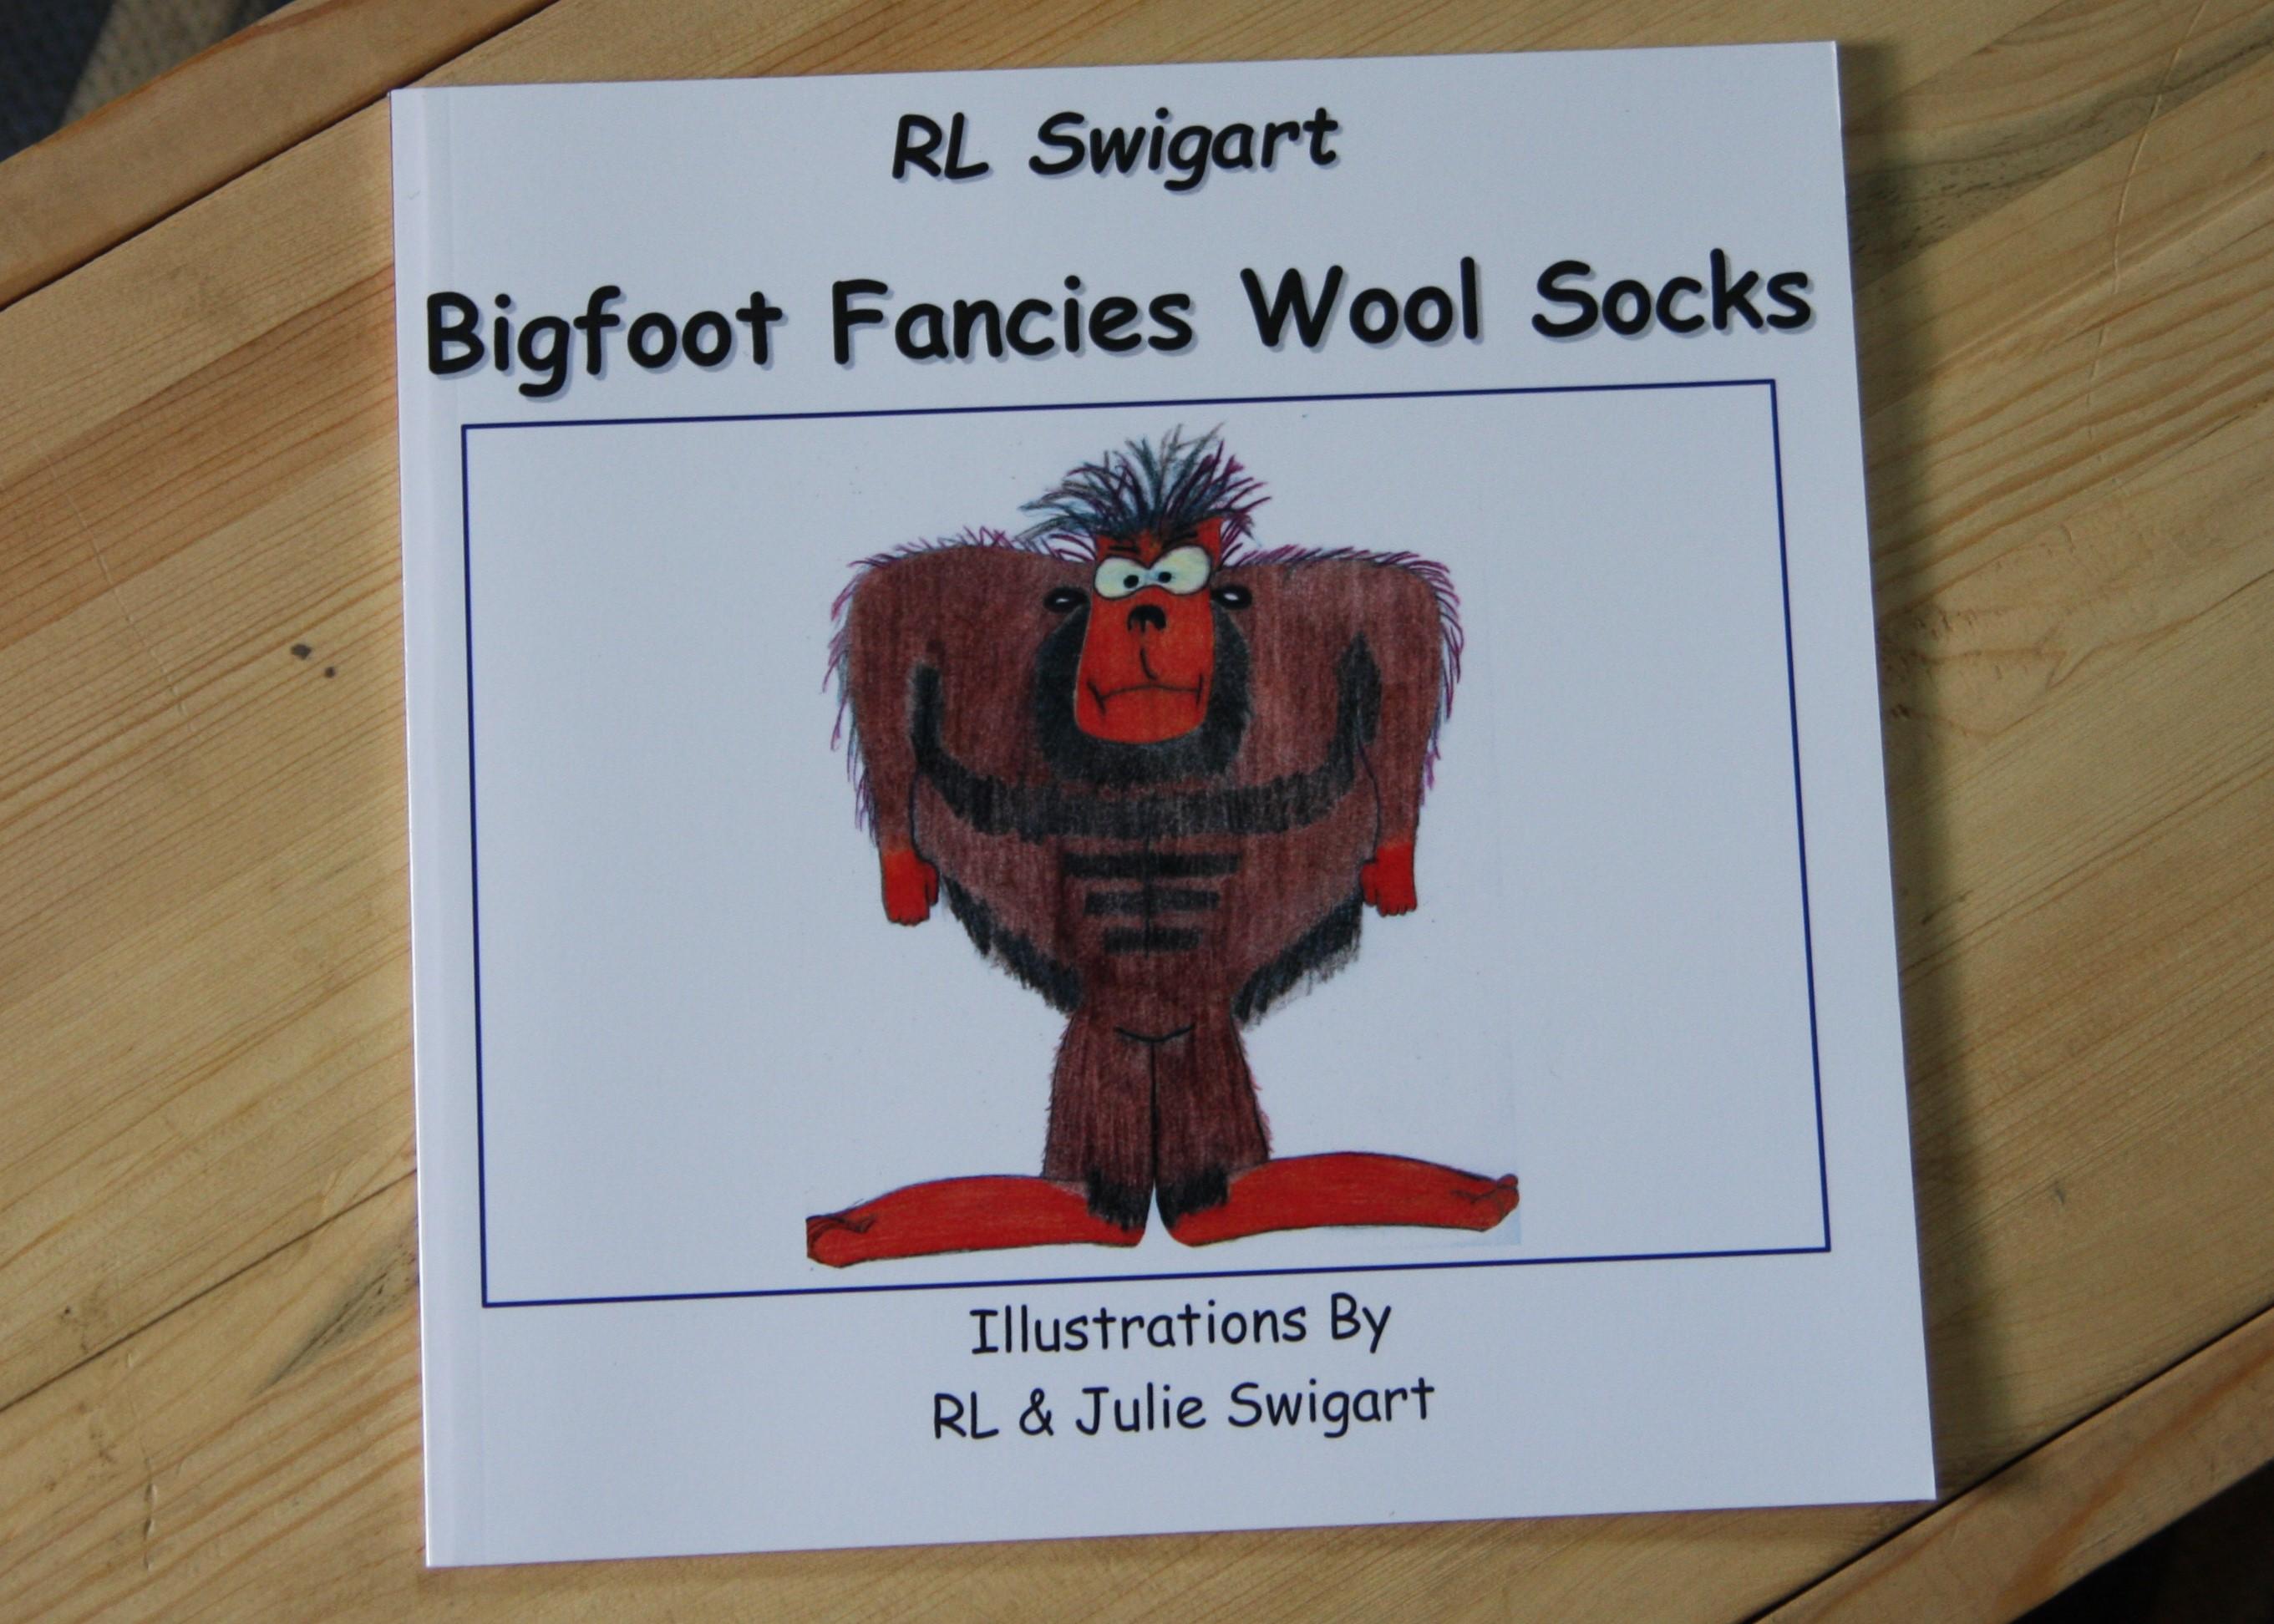 Bigfoot Fancies Wool Socks